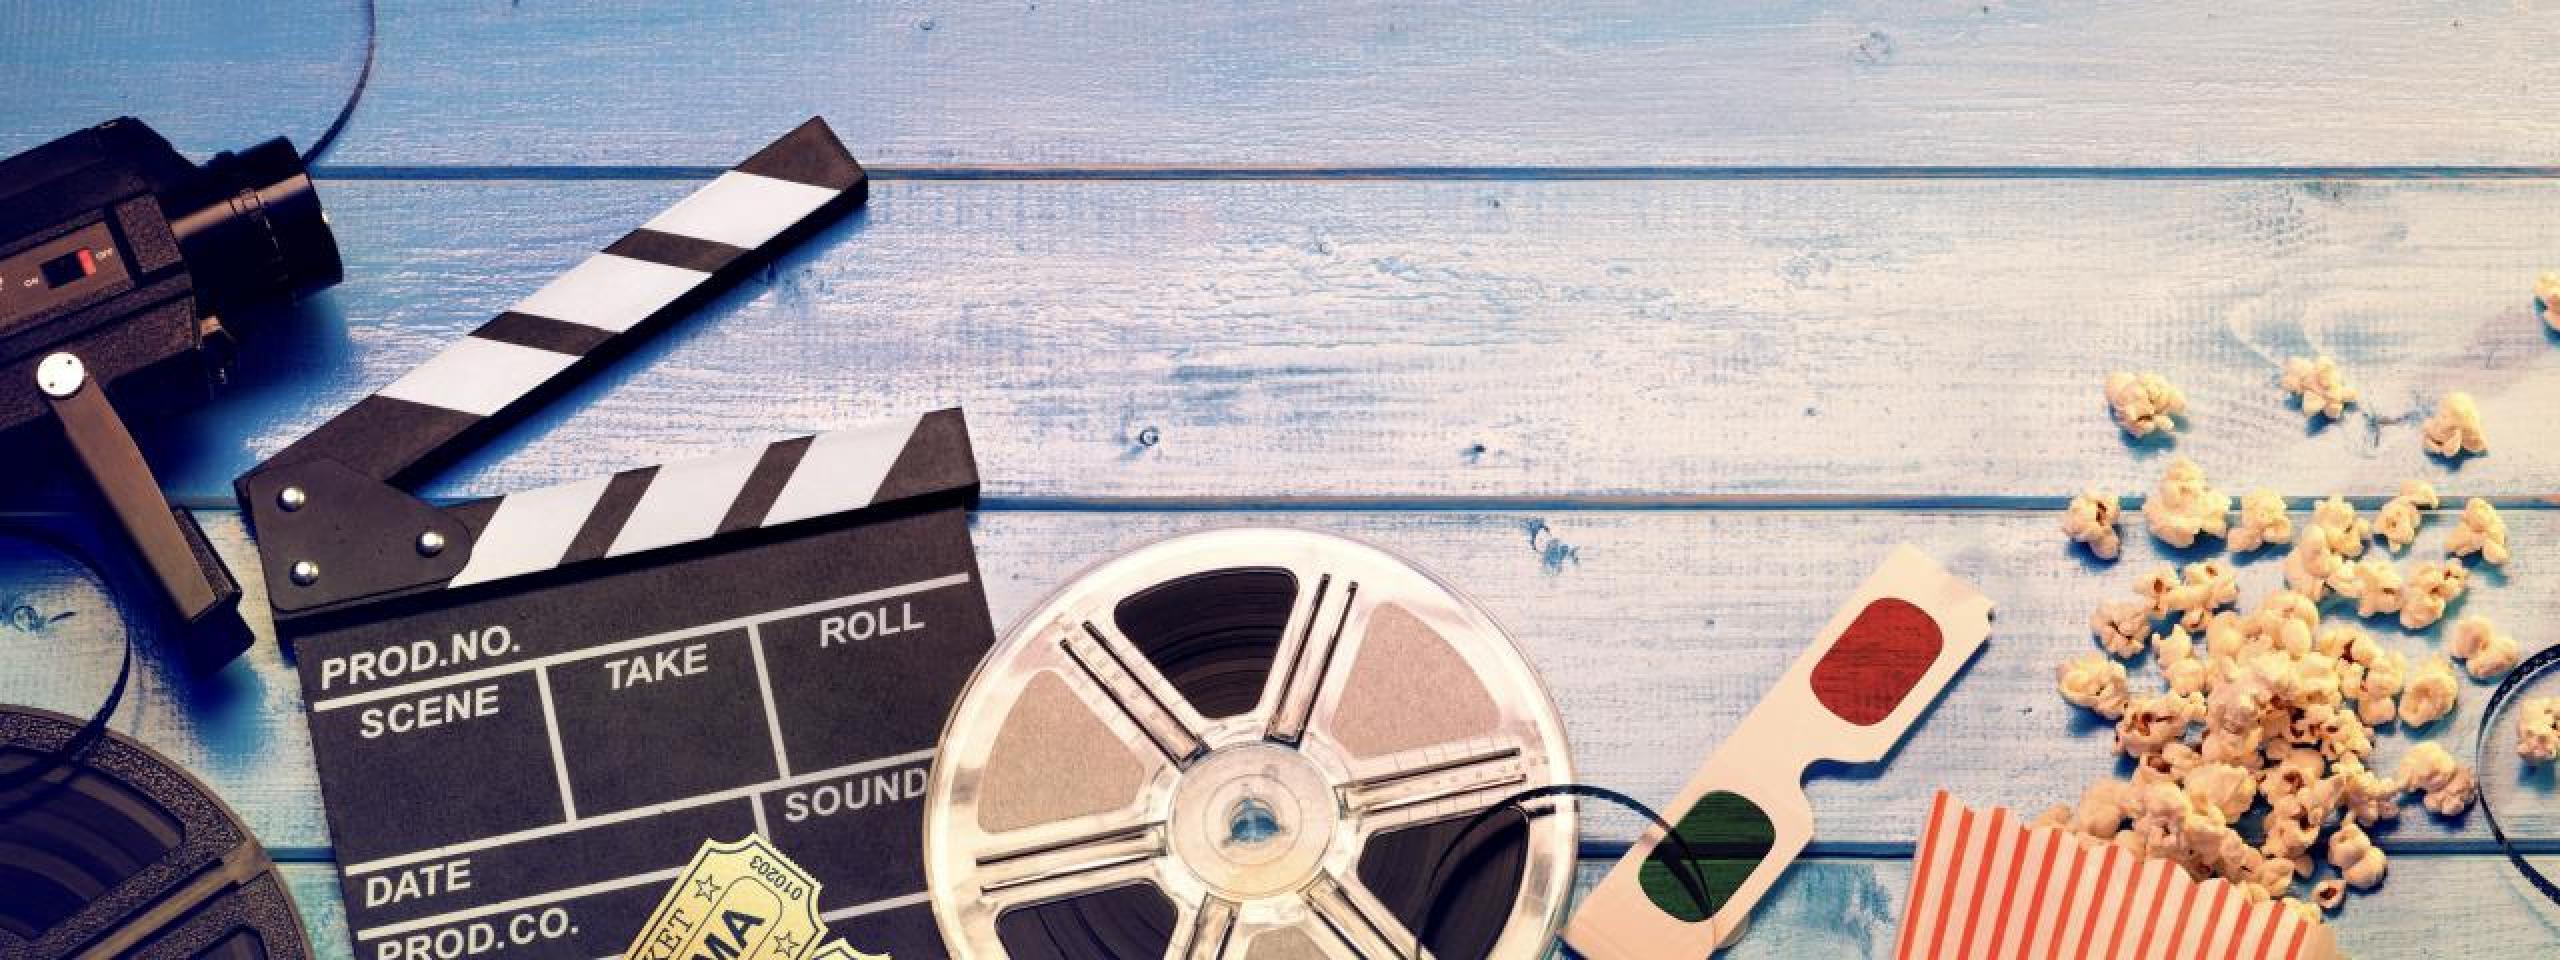 Film Canister, gafas 3D y claqueta en una mesa de madera azul